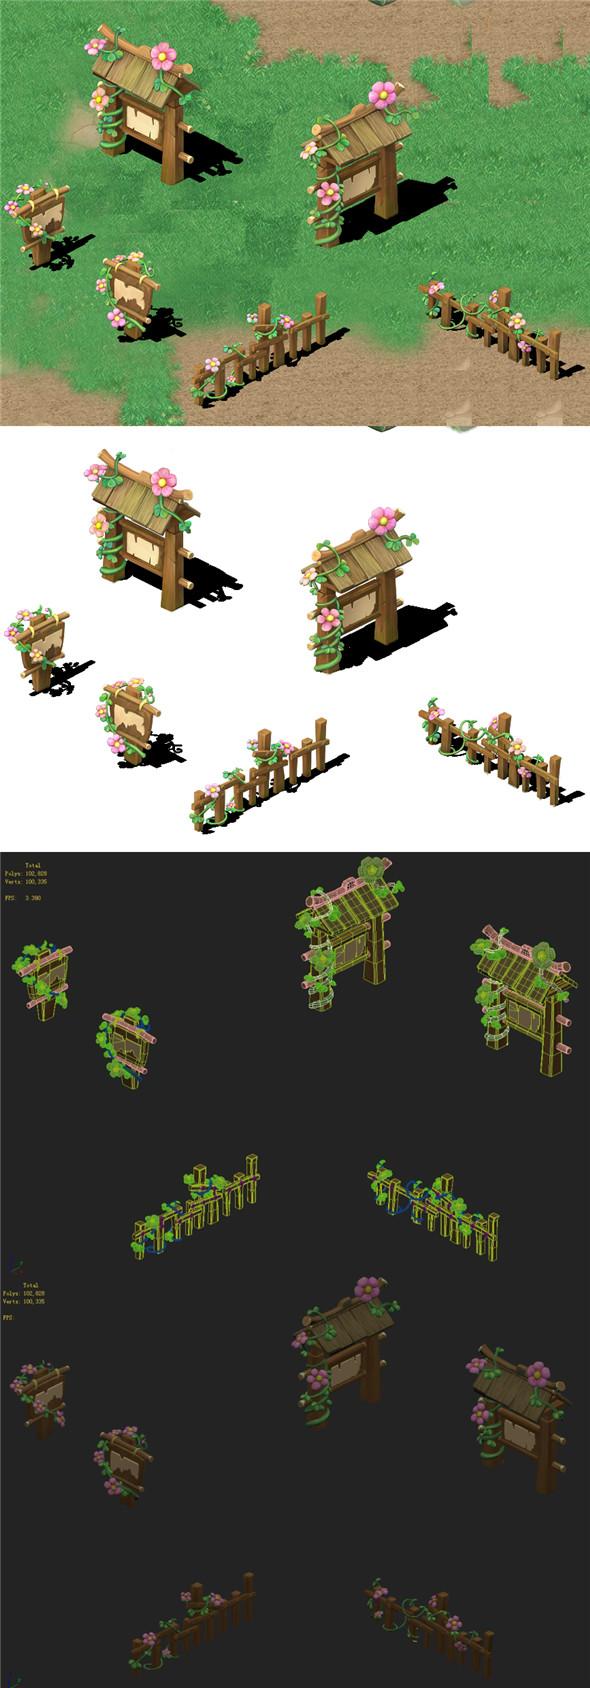 Cartoon version - flower sign - 3DOcean Item for Sale